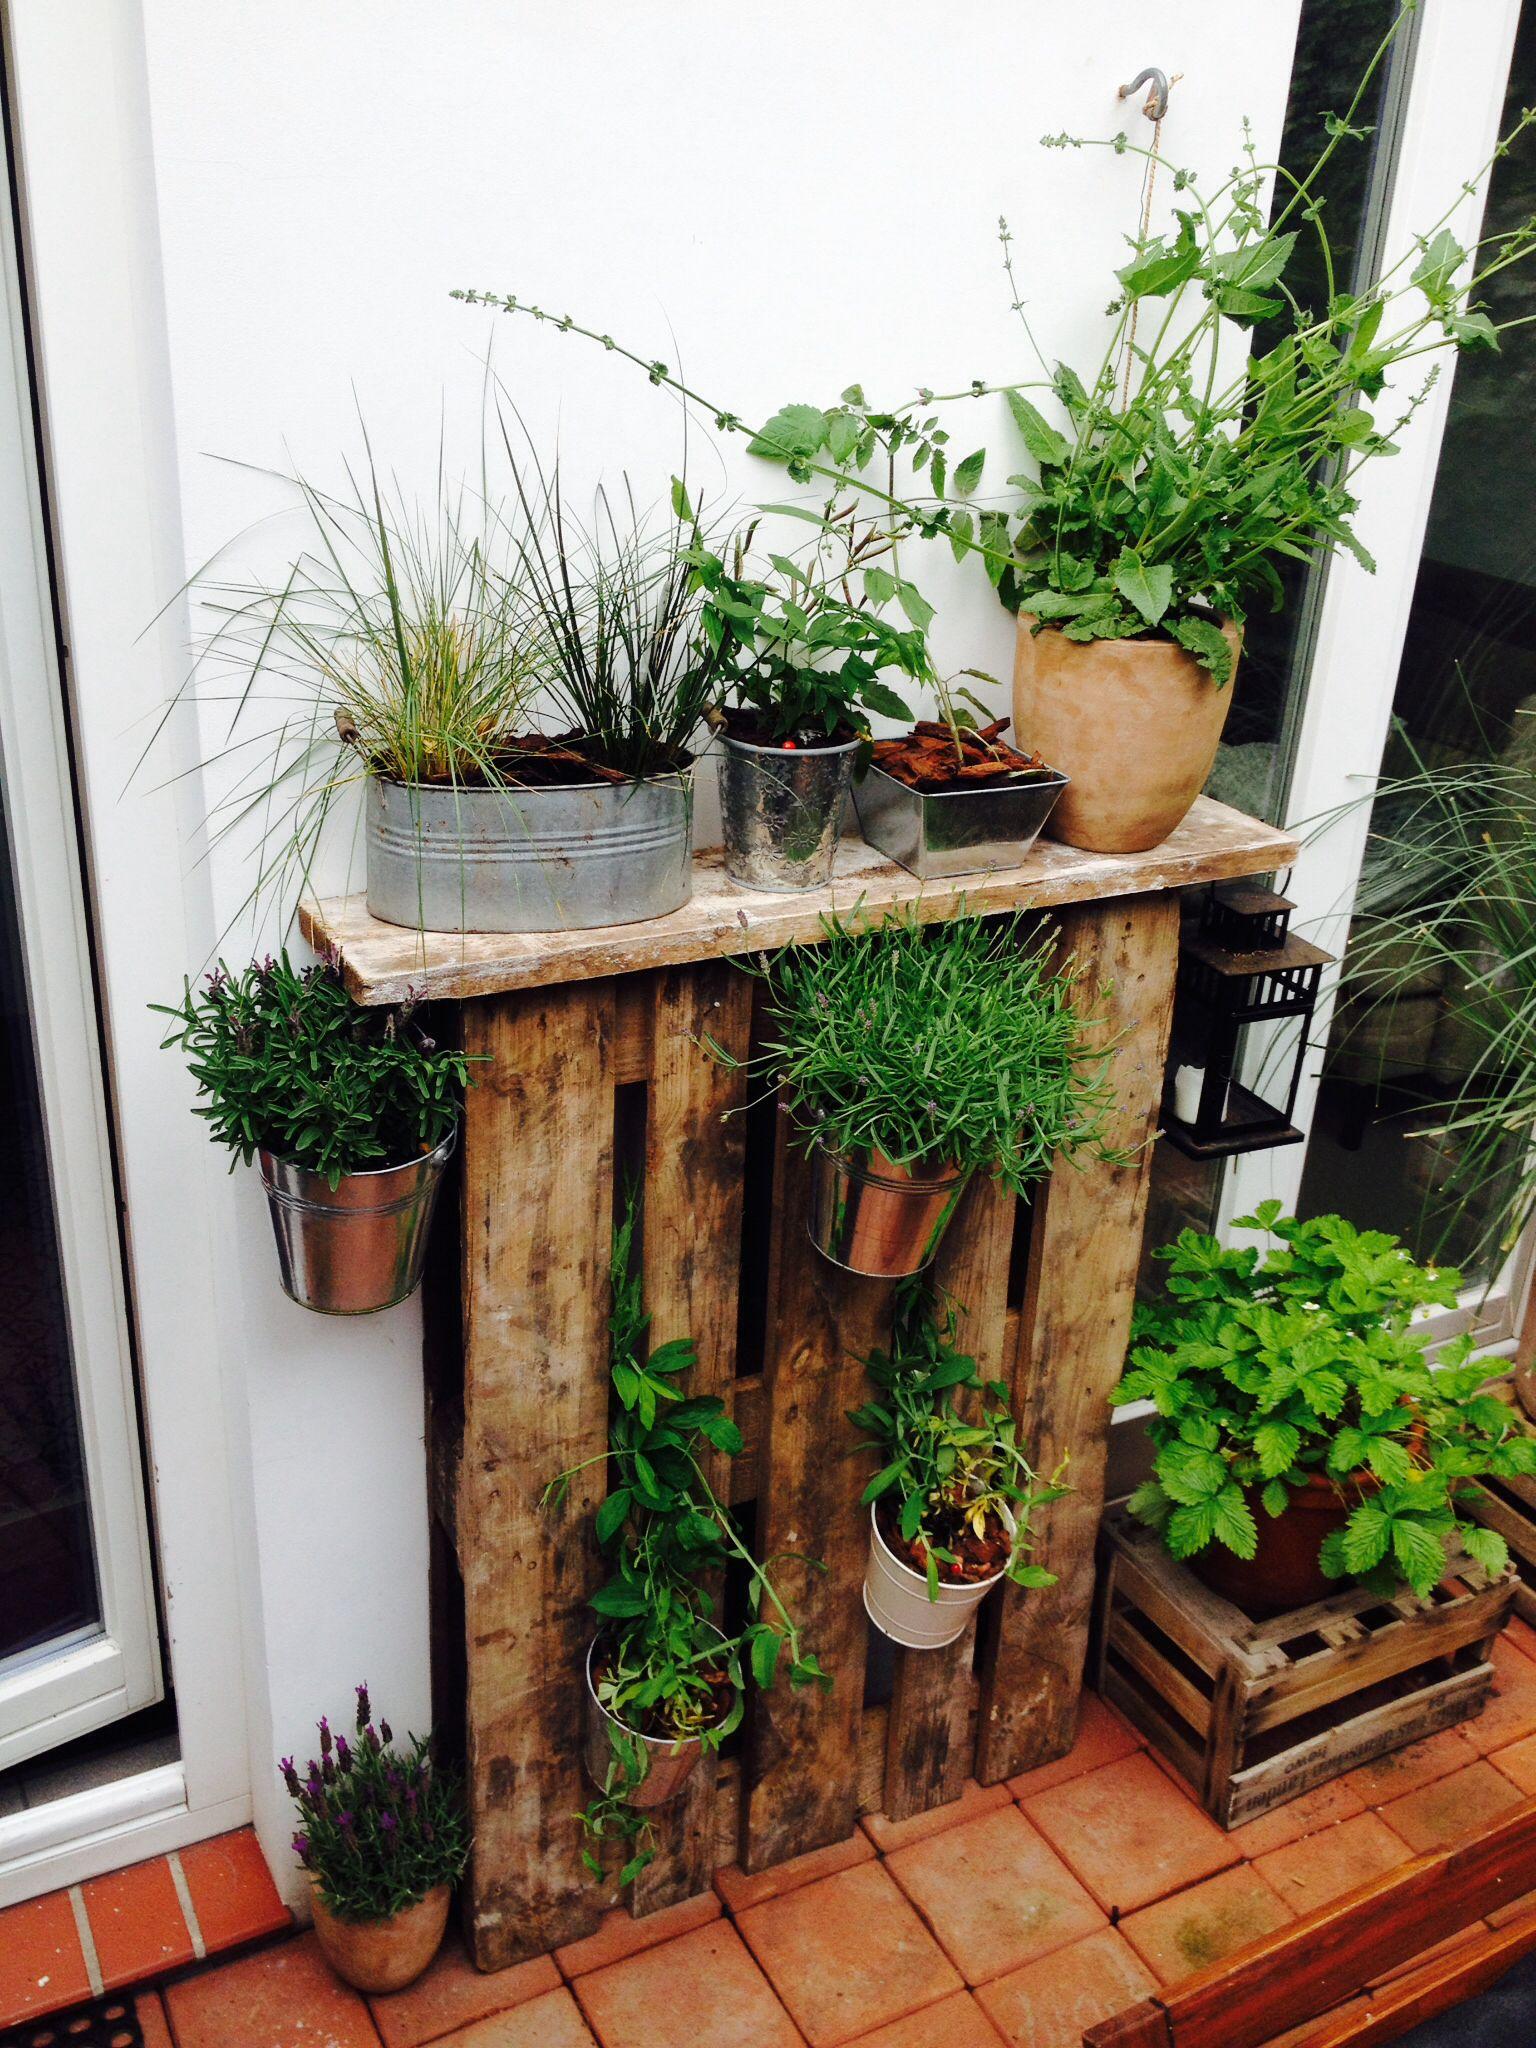 Garten paletten deko handwerk aus holz pinterest garden ideas and gardens - Paletten gartenregal ...